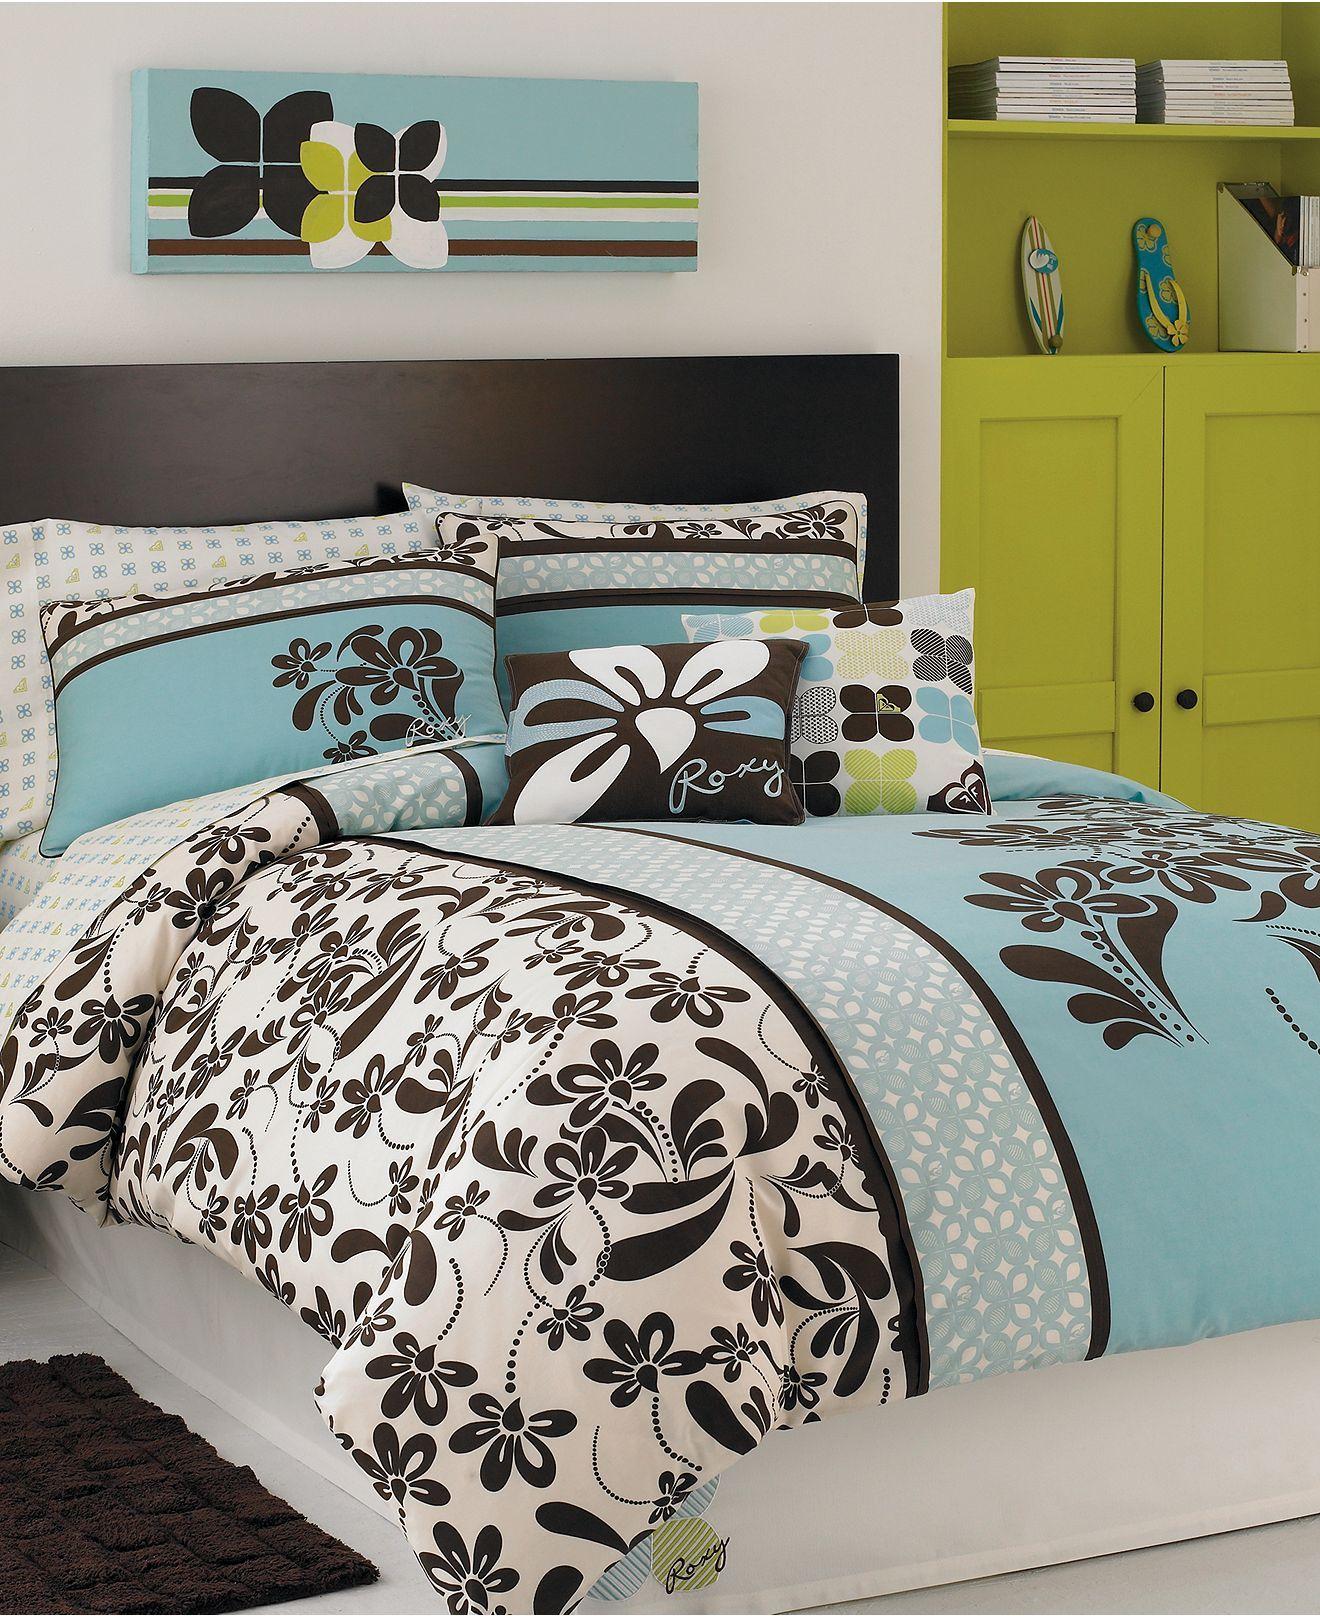 roxy bedding julia duvet cover sets